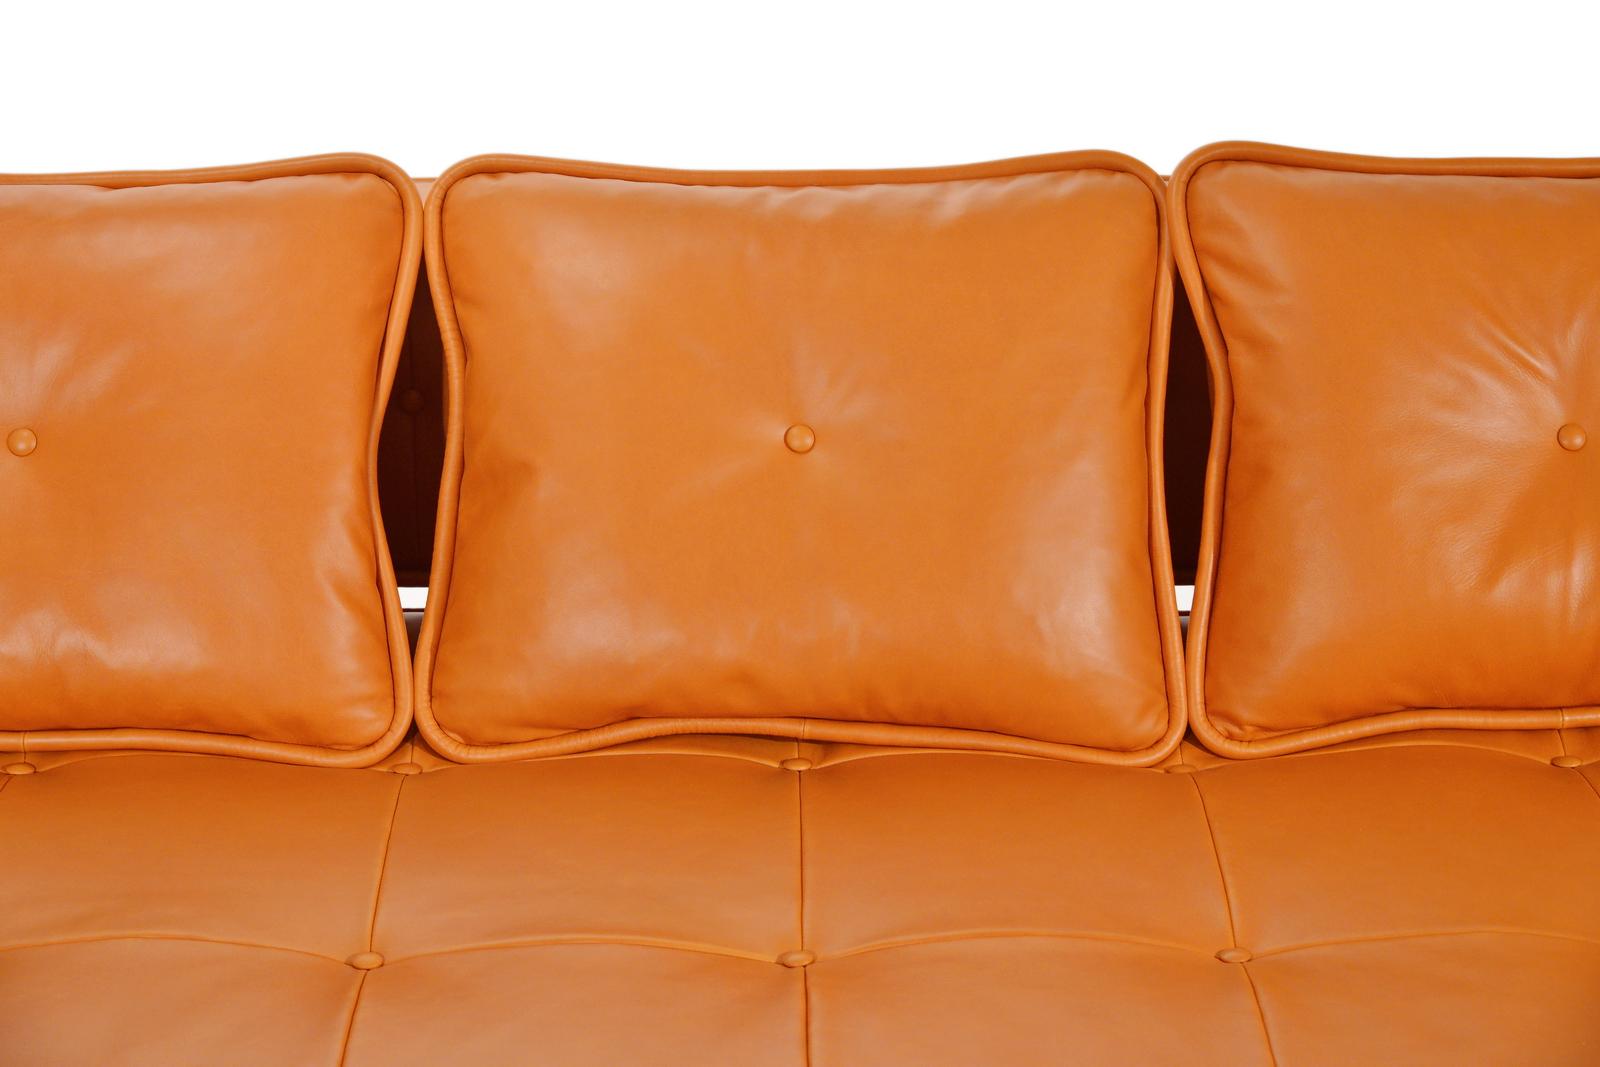 PTendercool-Sofa Corner-BS3-TE-BL-NO-Leather-210623-06